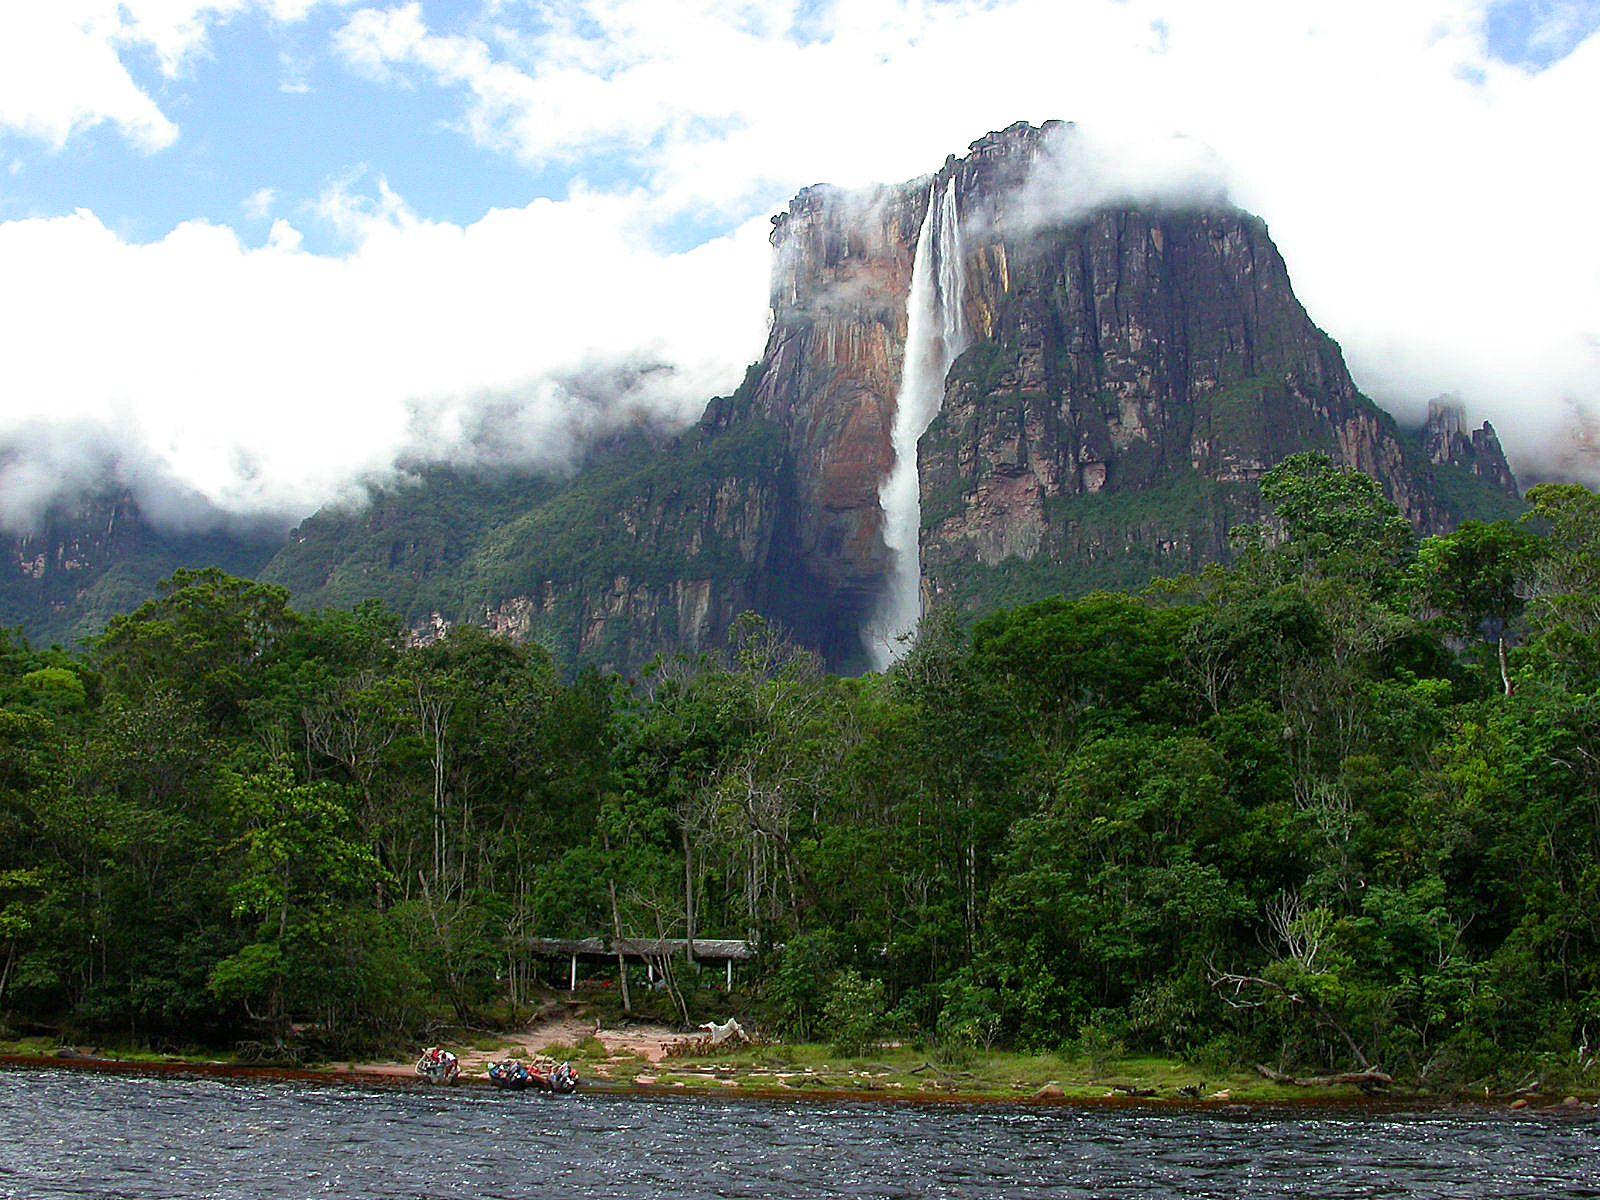 60788 descargar fondo de pantalla Paisaje, Venezuela, Naturaleza, Sudario, Mortaja, Monte Rorayma, Monte Roraima, Roraima: protectores de pantalla e imágenes gratis